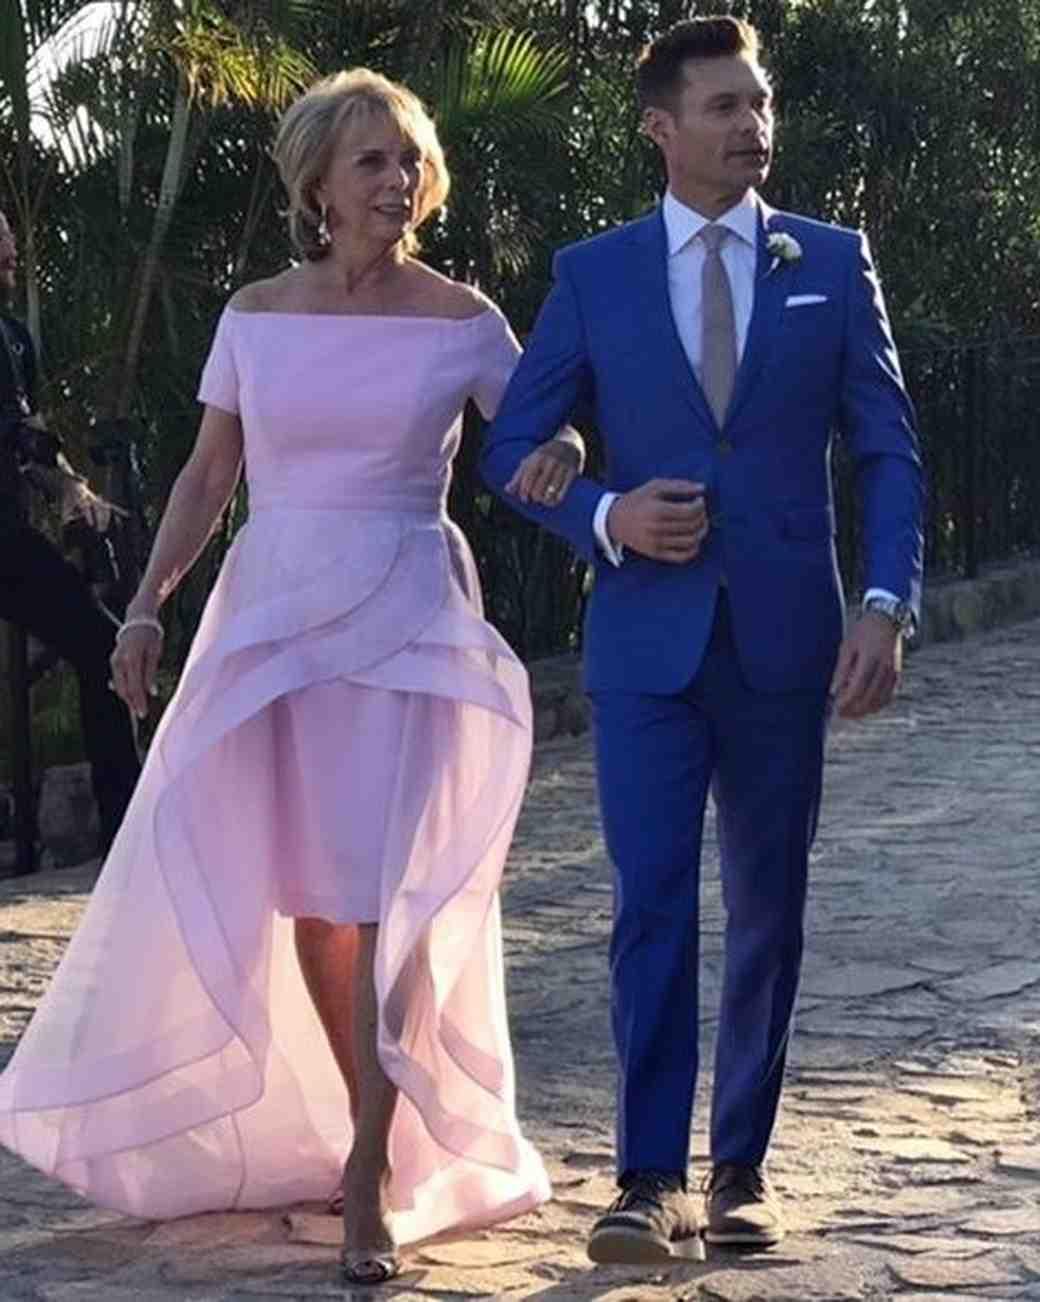 Constance Seacrest with Ryan Seacrest